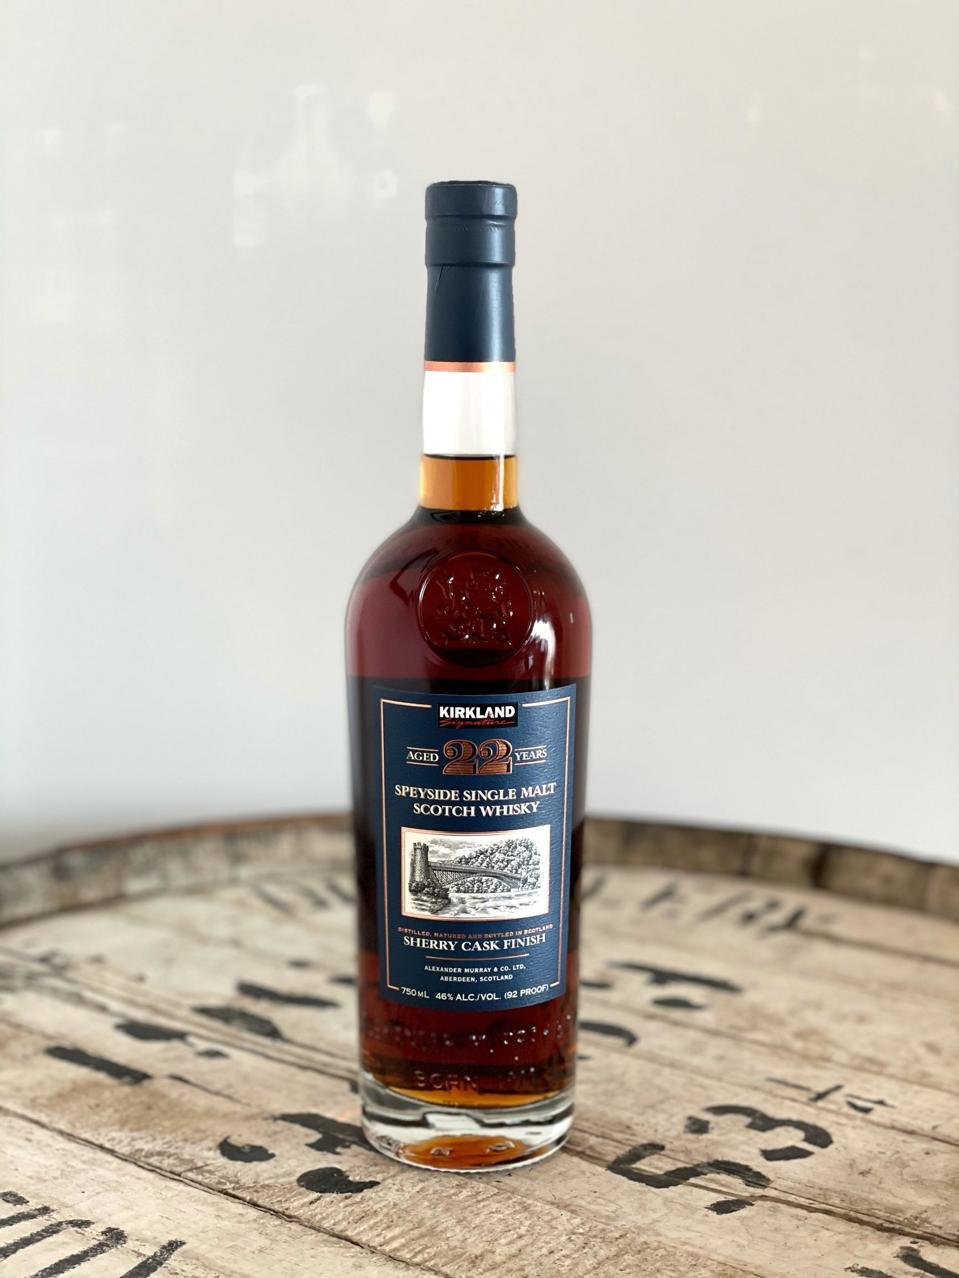 Kirkland Signature, 22 YO, Speyside Single Malt Scotch Whisky